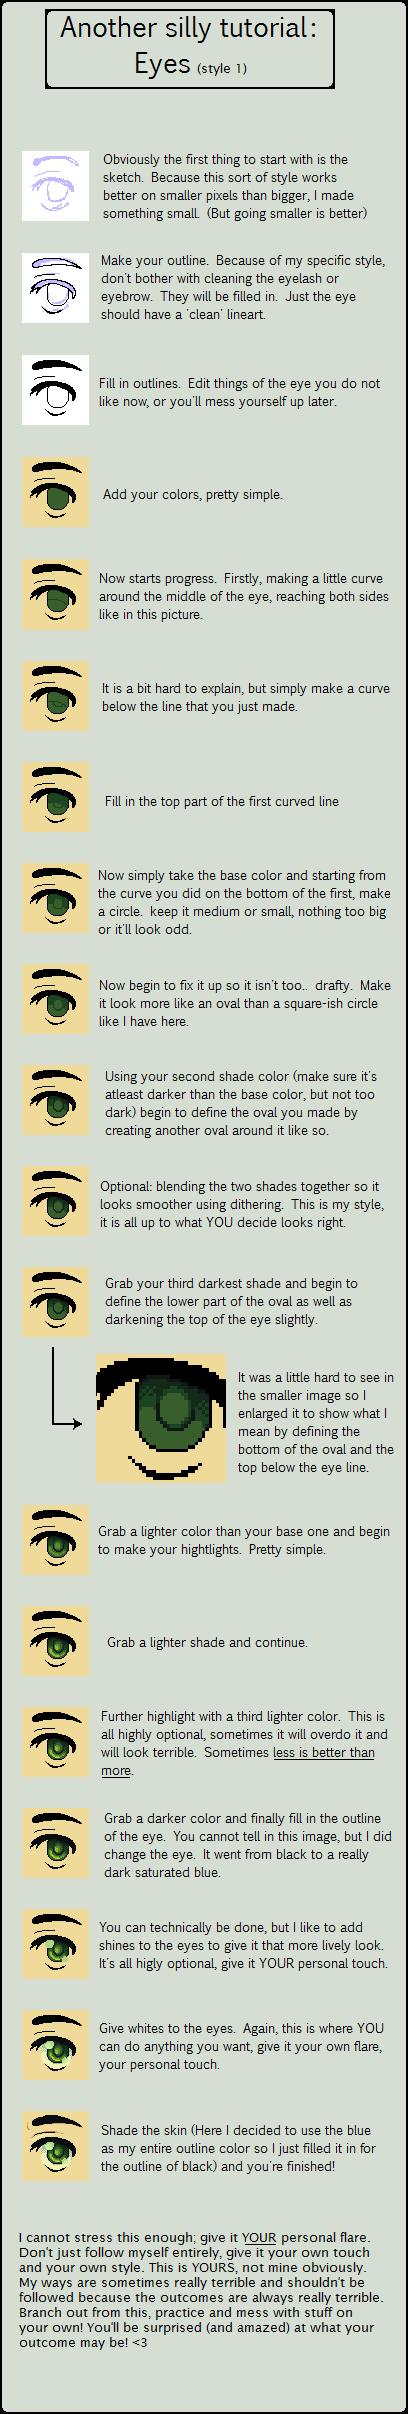 Eye style 1 - tutorial by grangerpixel